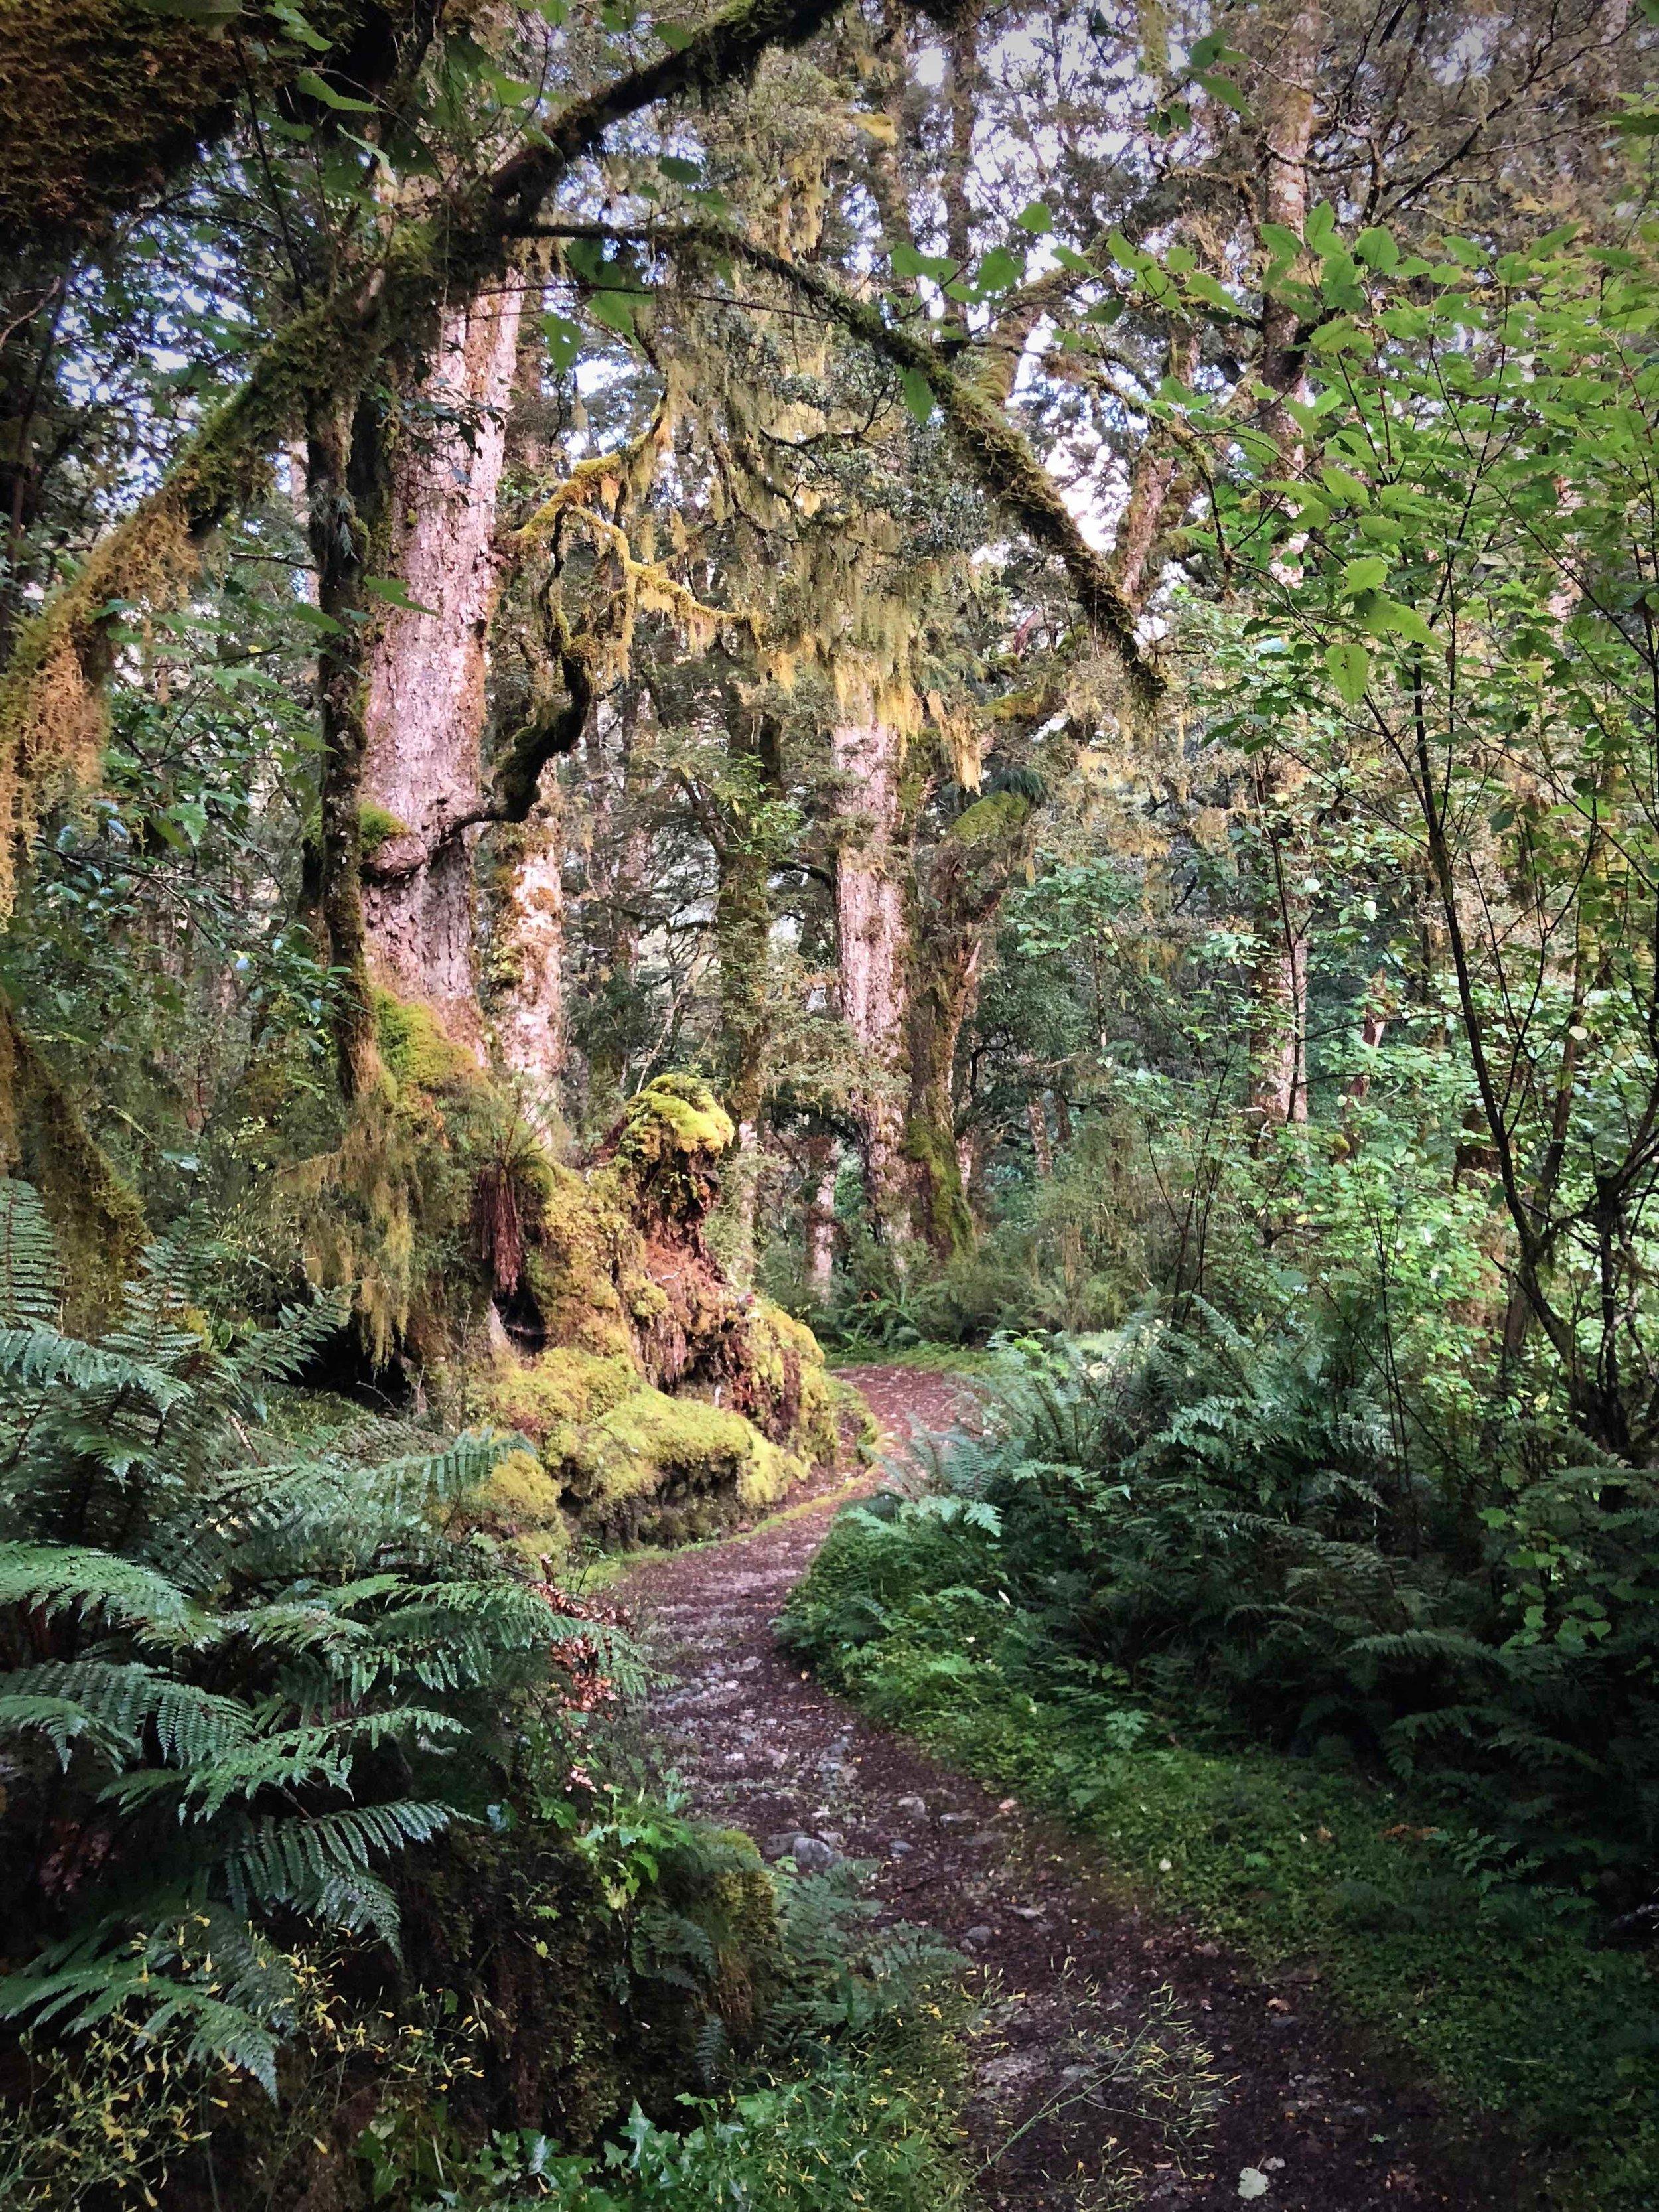 kepler-track-fiordland-new-zealand-hike.jpg